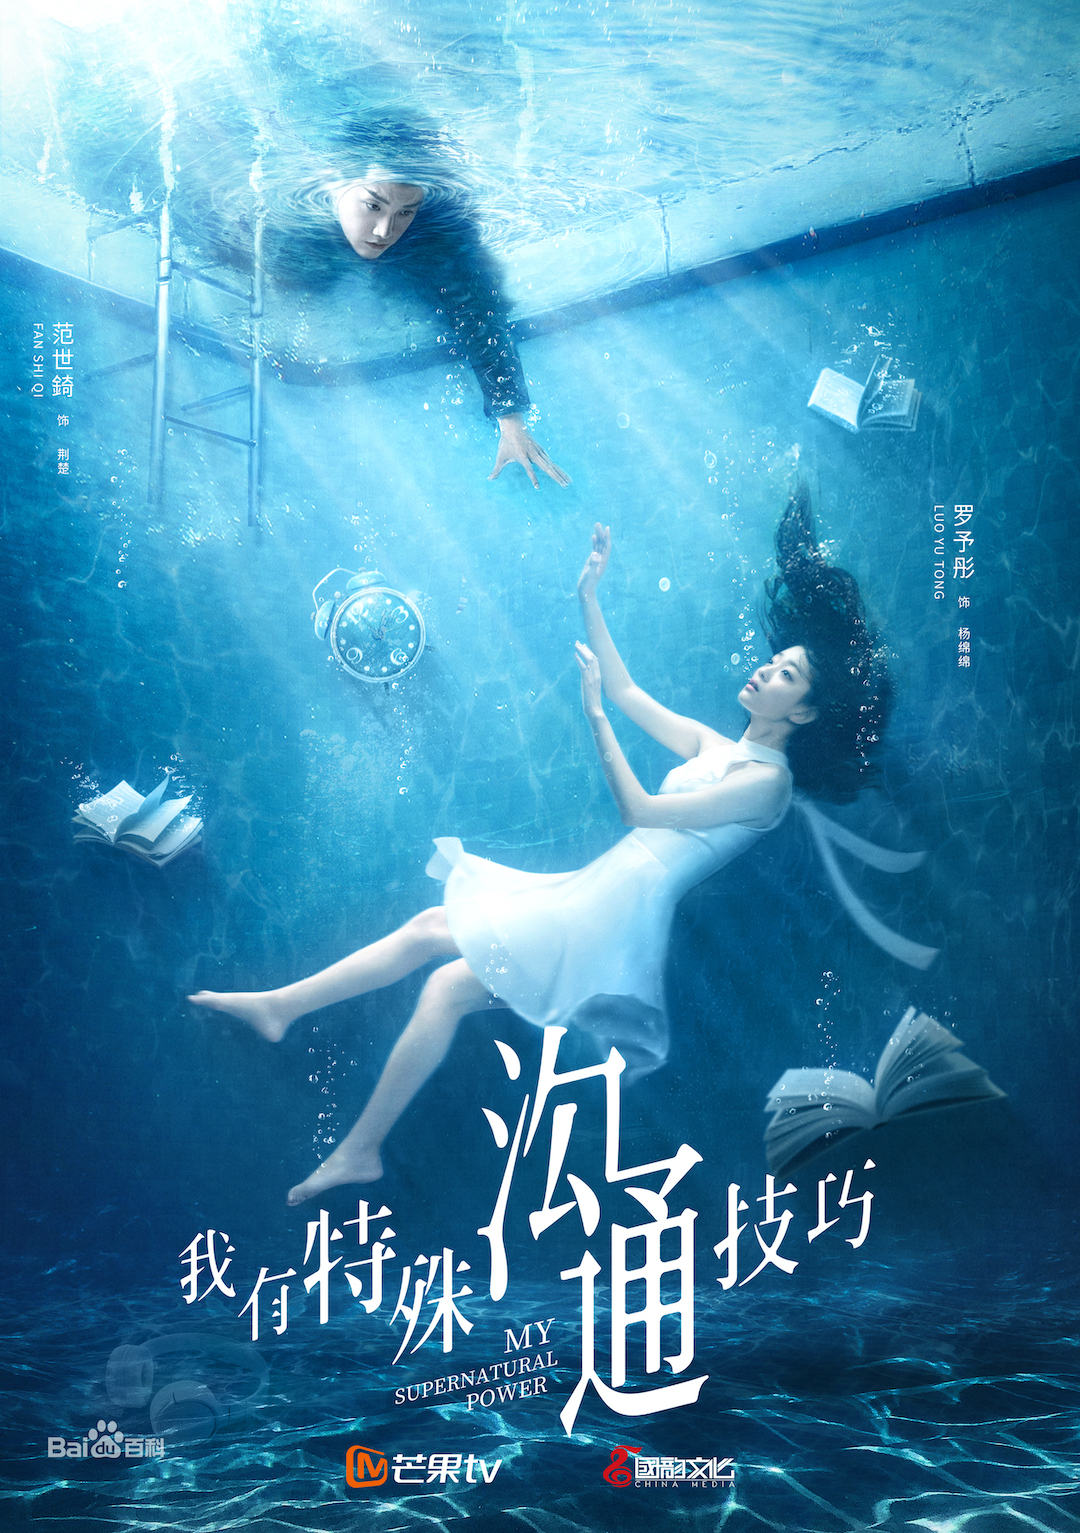 My Supernatural Power Chinese Drama Poster